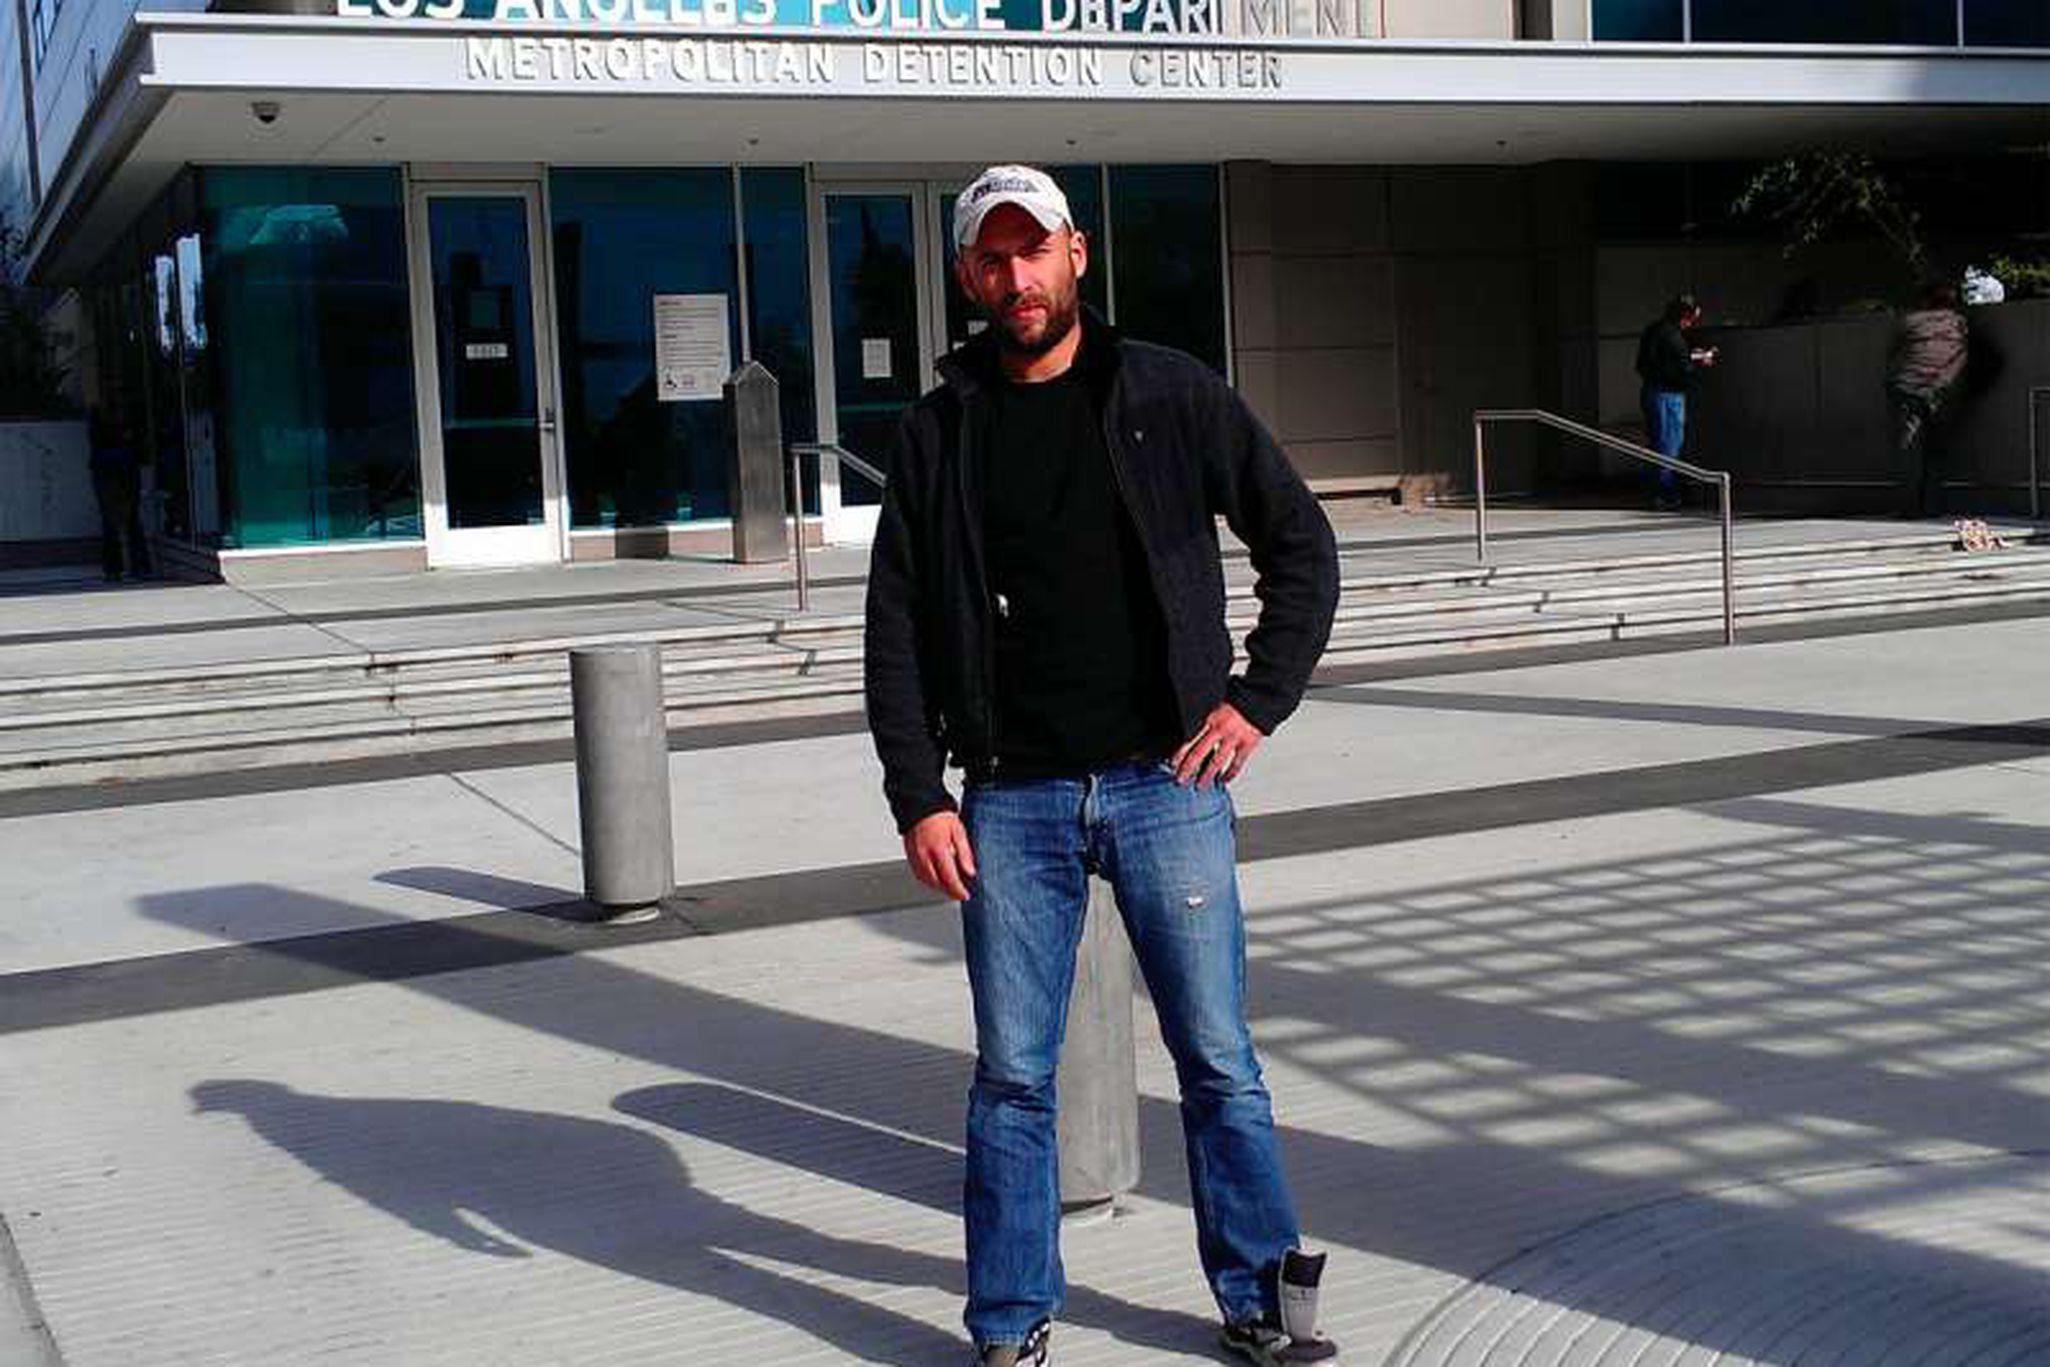 e151883c7b5 Yasha Levine  using the web to fight  journalistic malpractice ...